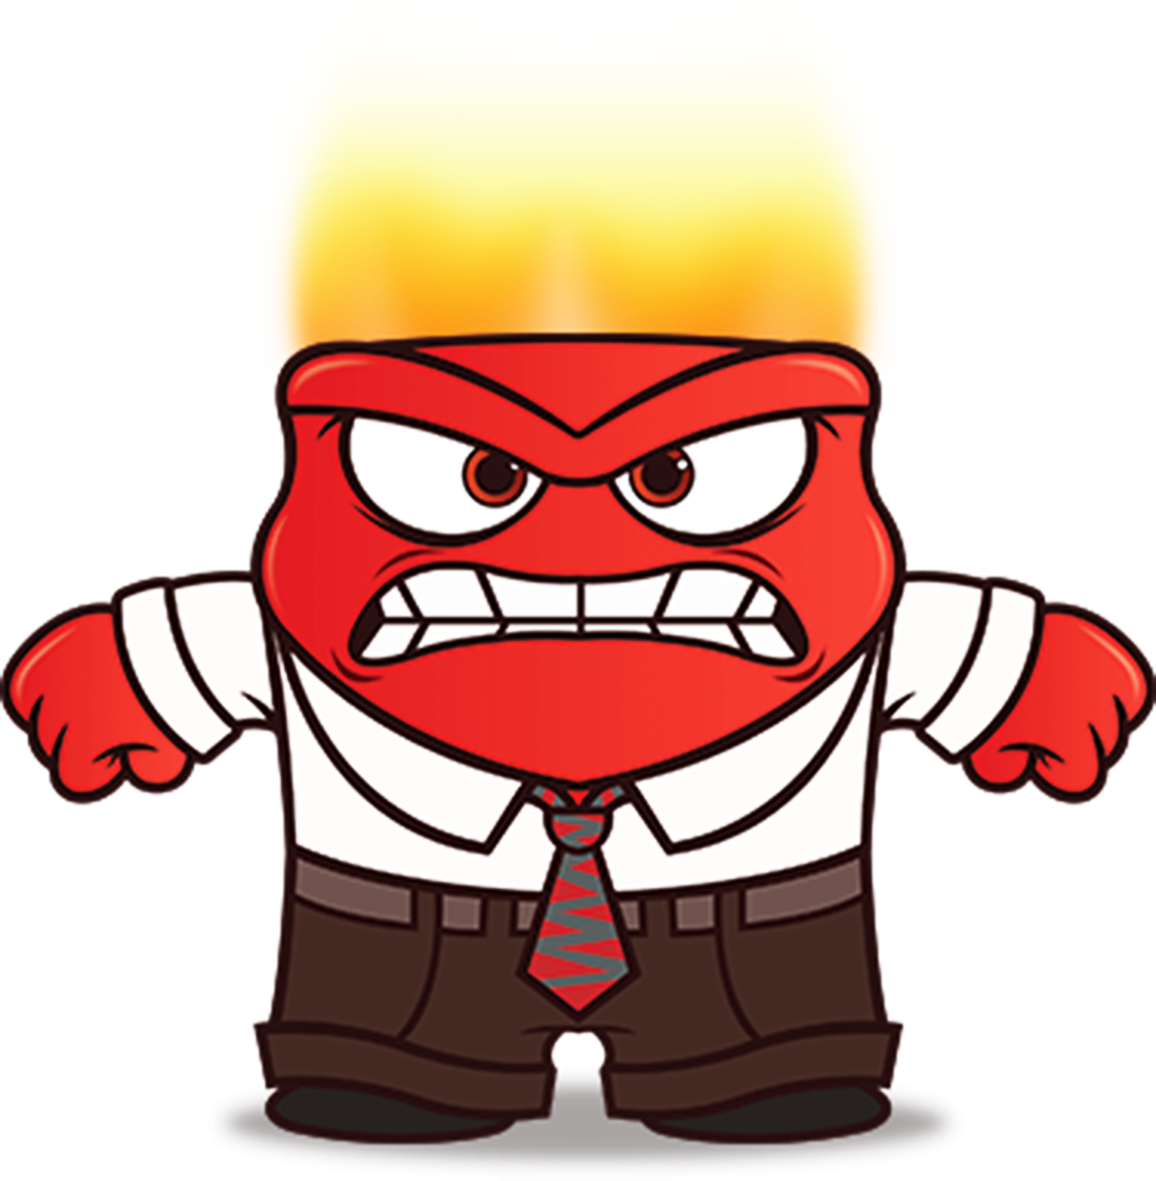 1156x1181 3005 Inside Out Anger Clip Art , Height 8 Cm, Decal Sticker